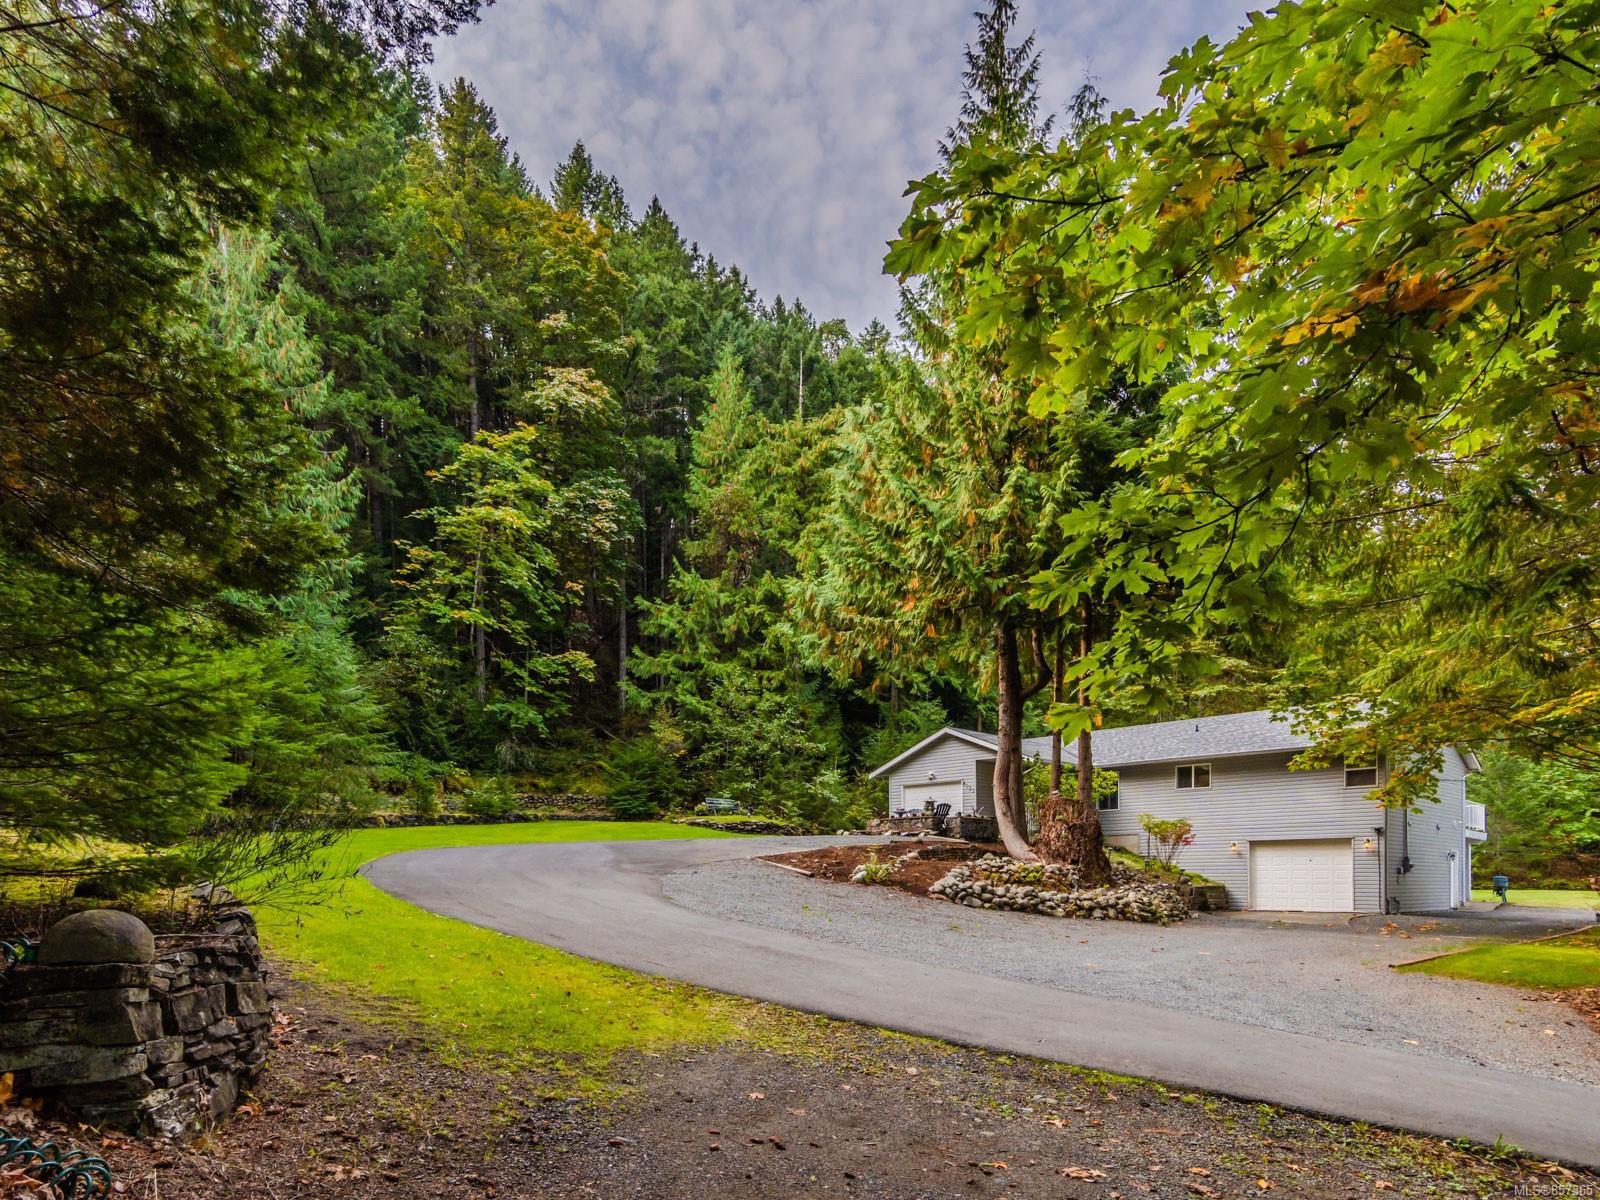 Main Photo: 8033 Sywash Ridge Rd in : Na Upper Lantzville House for sale (Nanaimo)  : MLS®# 857365